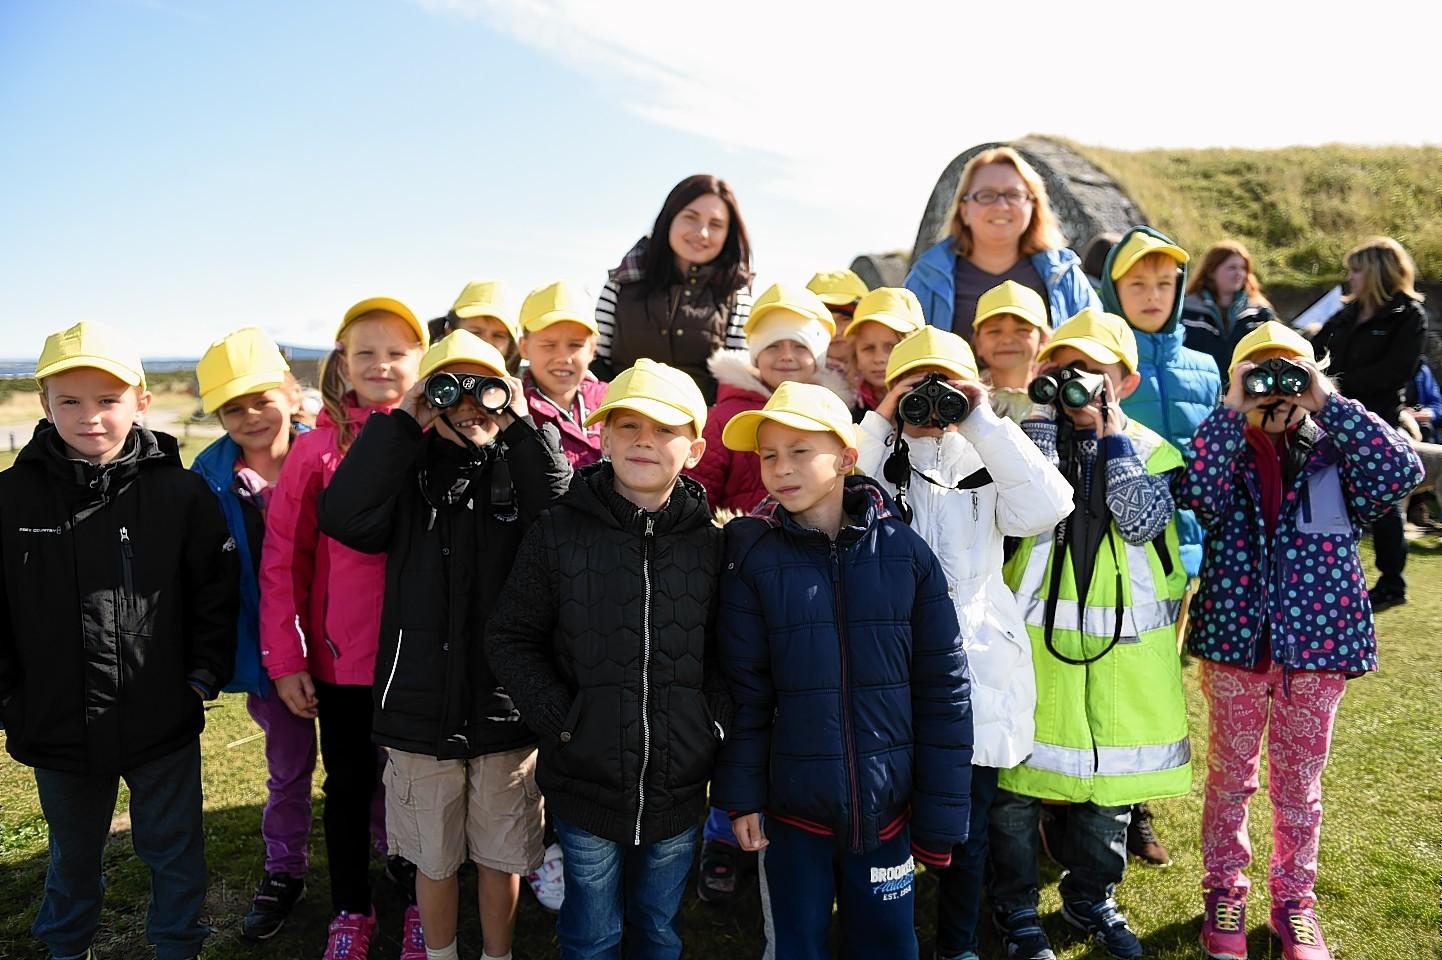 Children from Chernobyl visit Moray. Picture by Gordon Lennox